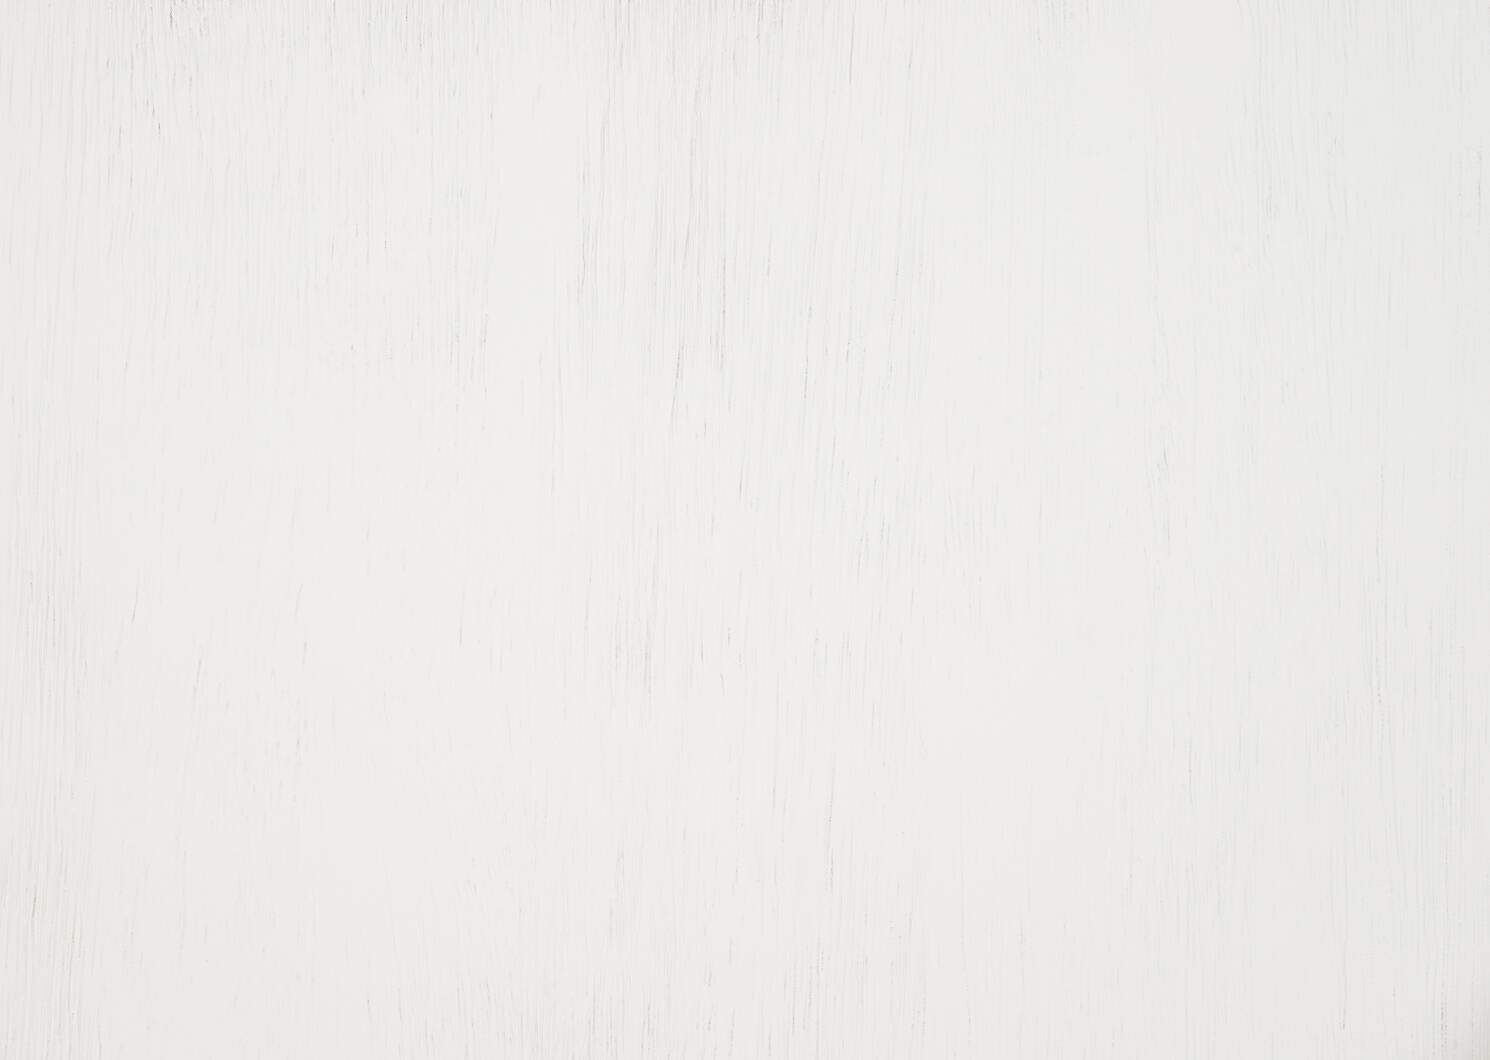 Hershel Counter Stool -Yvie Chantilly